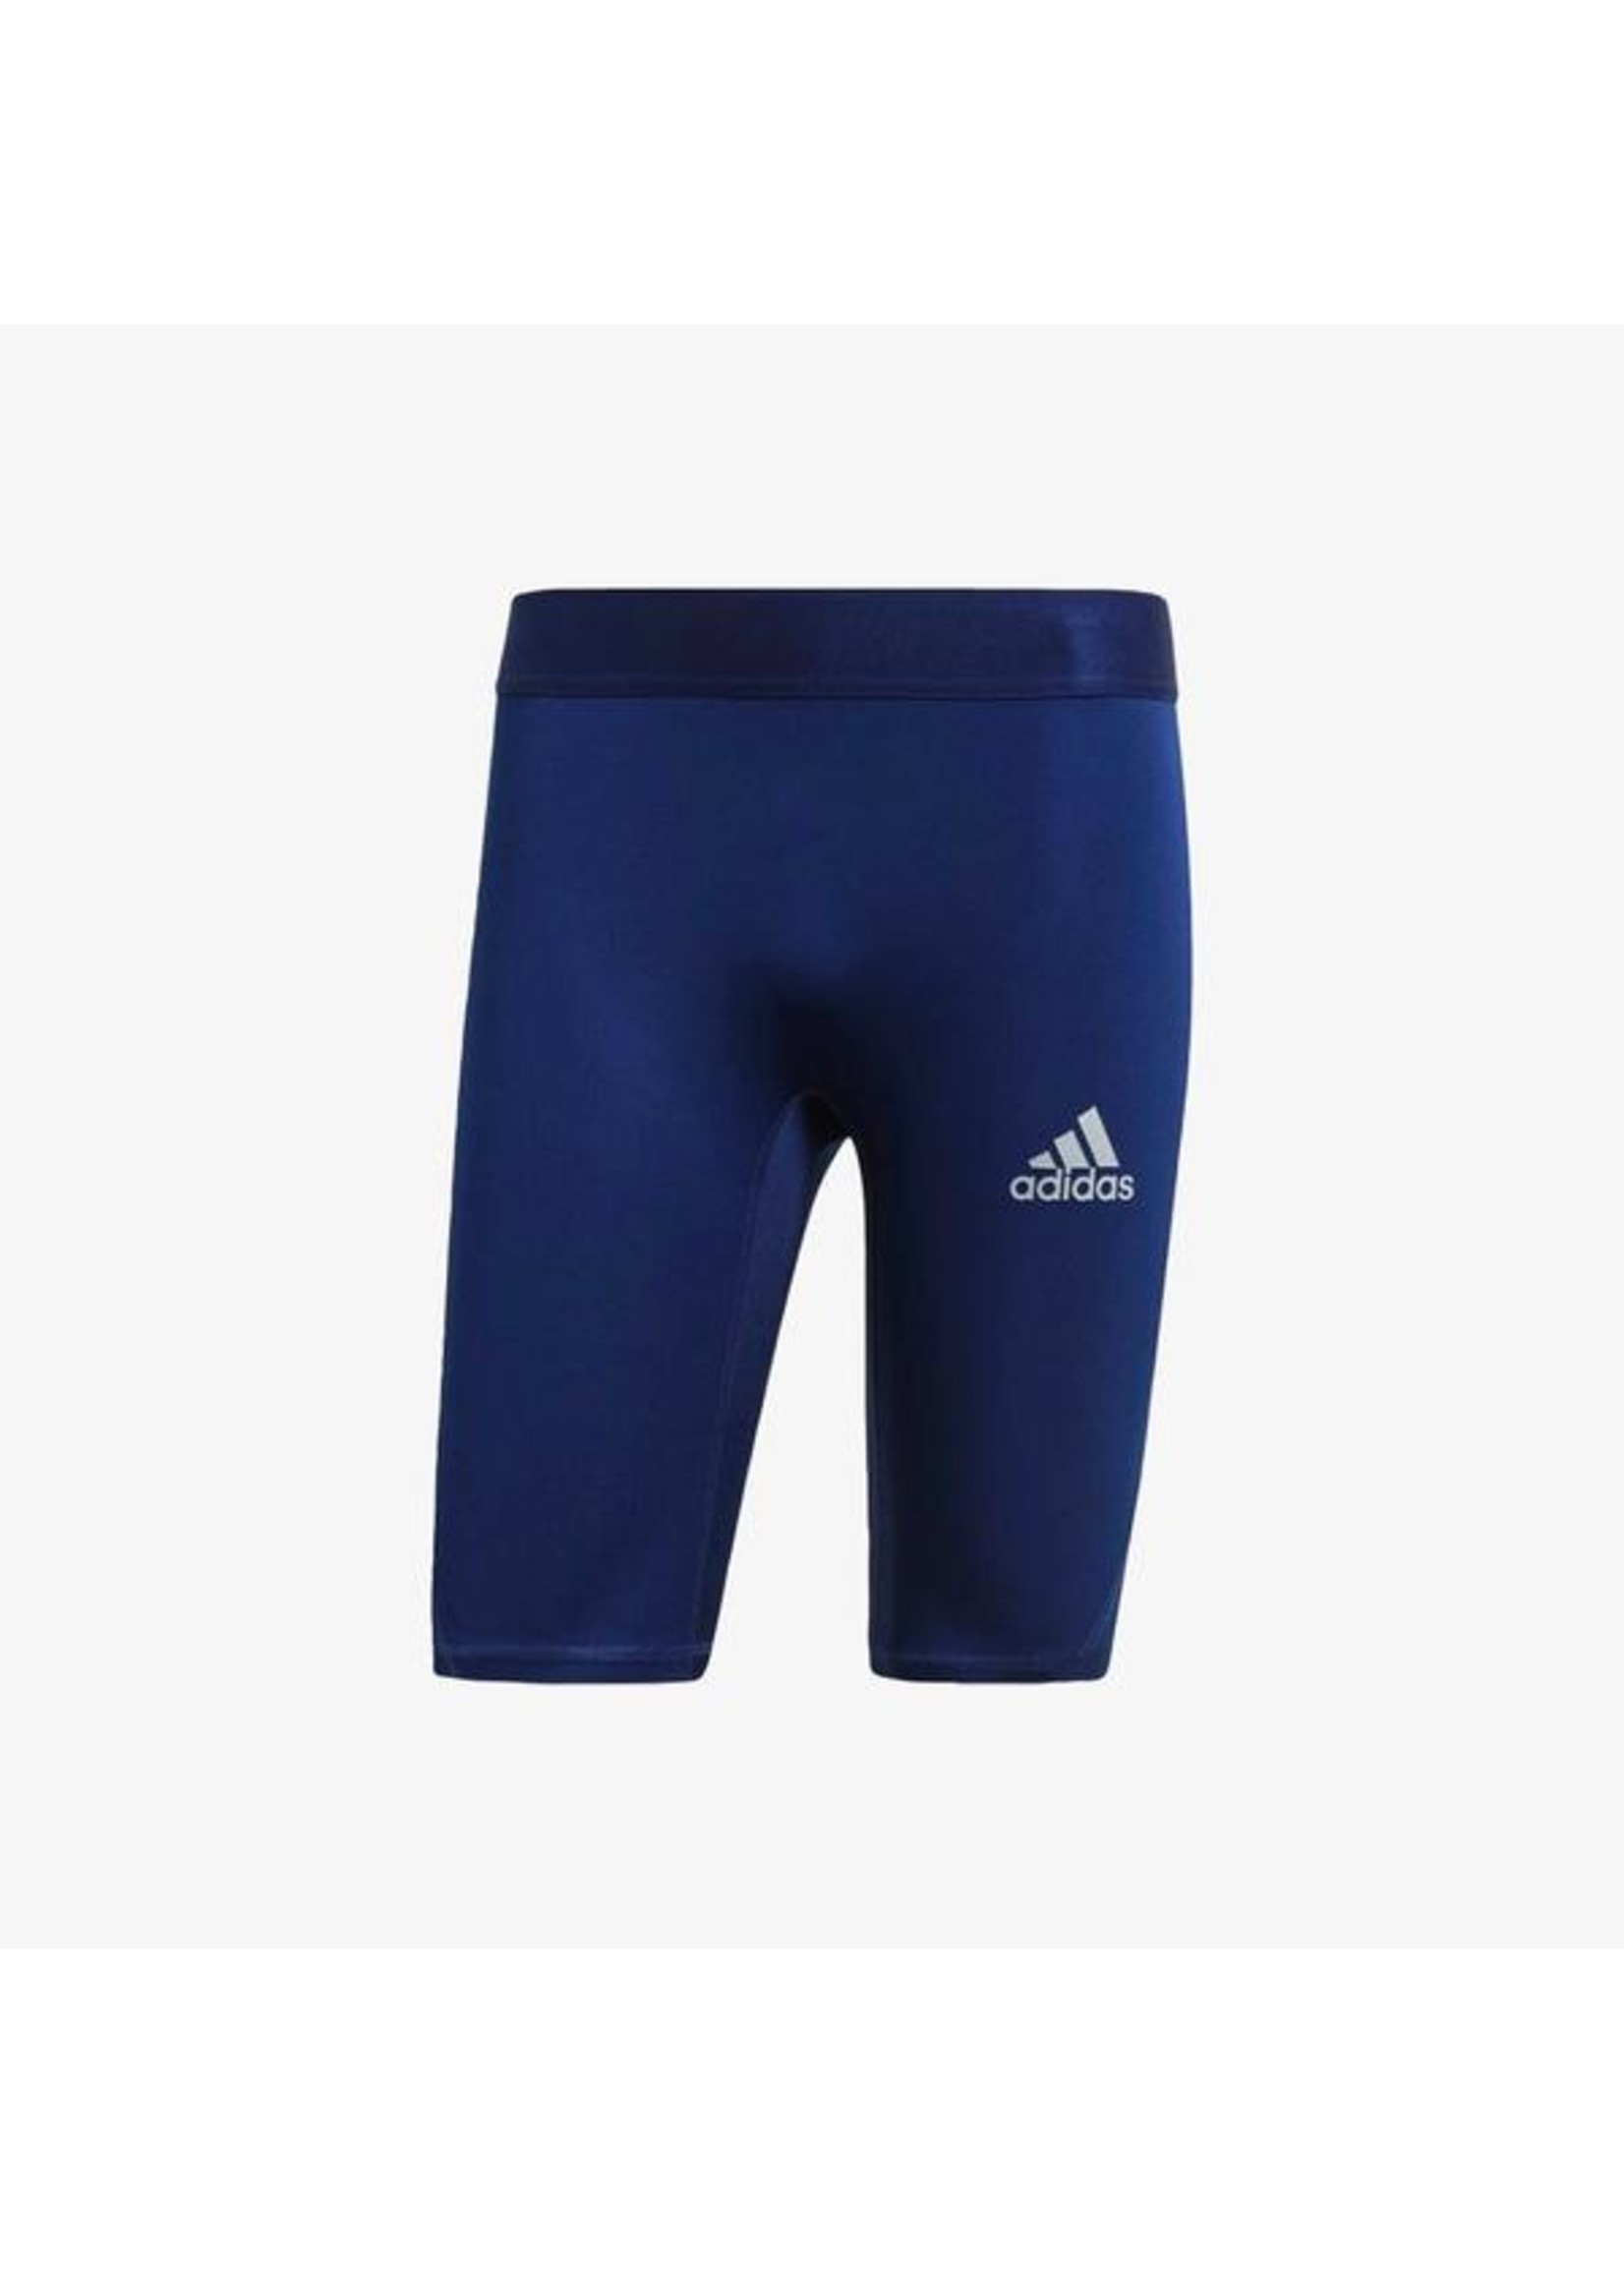 Adidas Compression Navy Short Adult